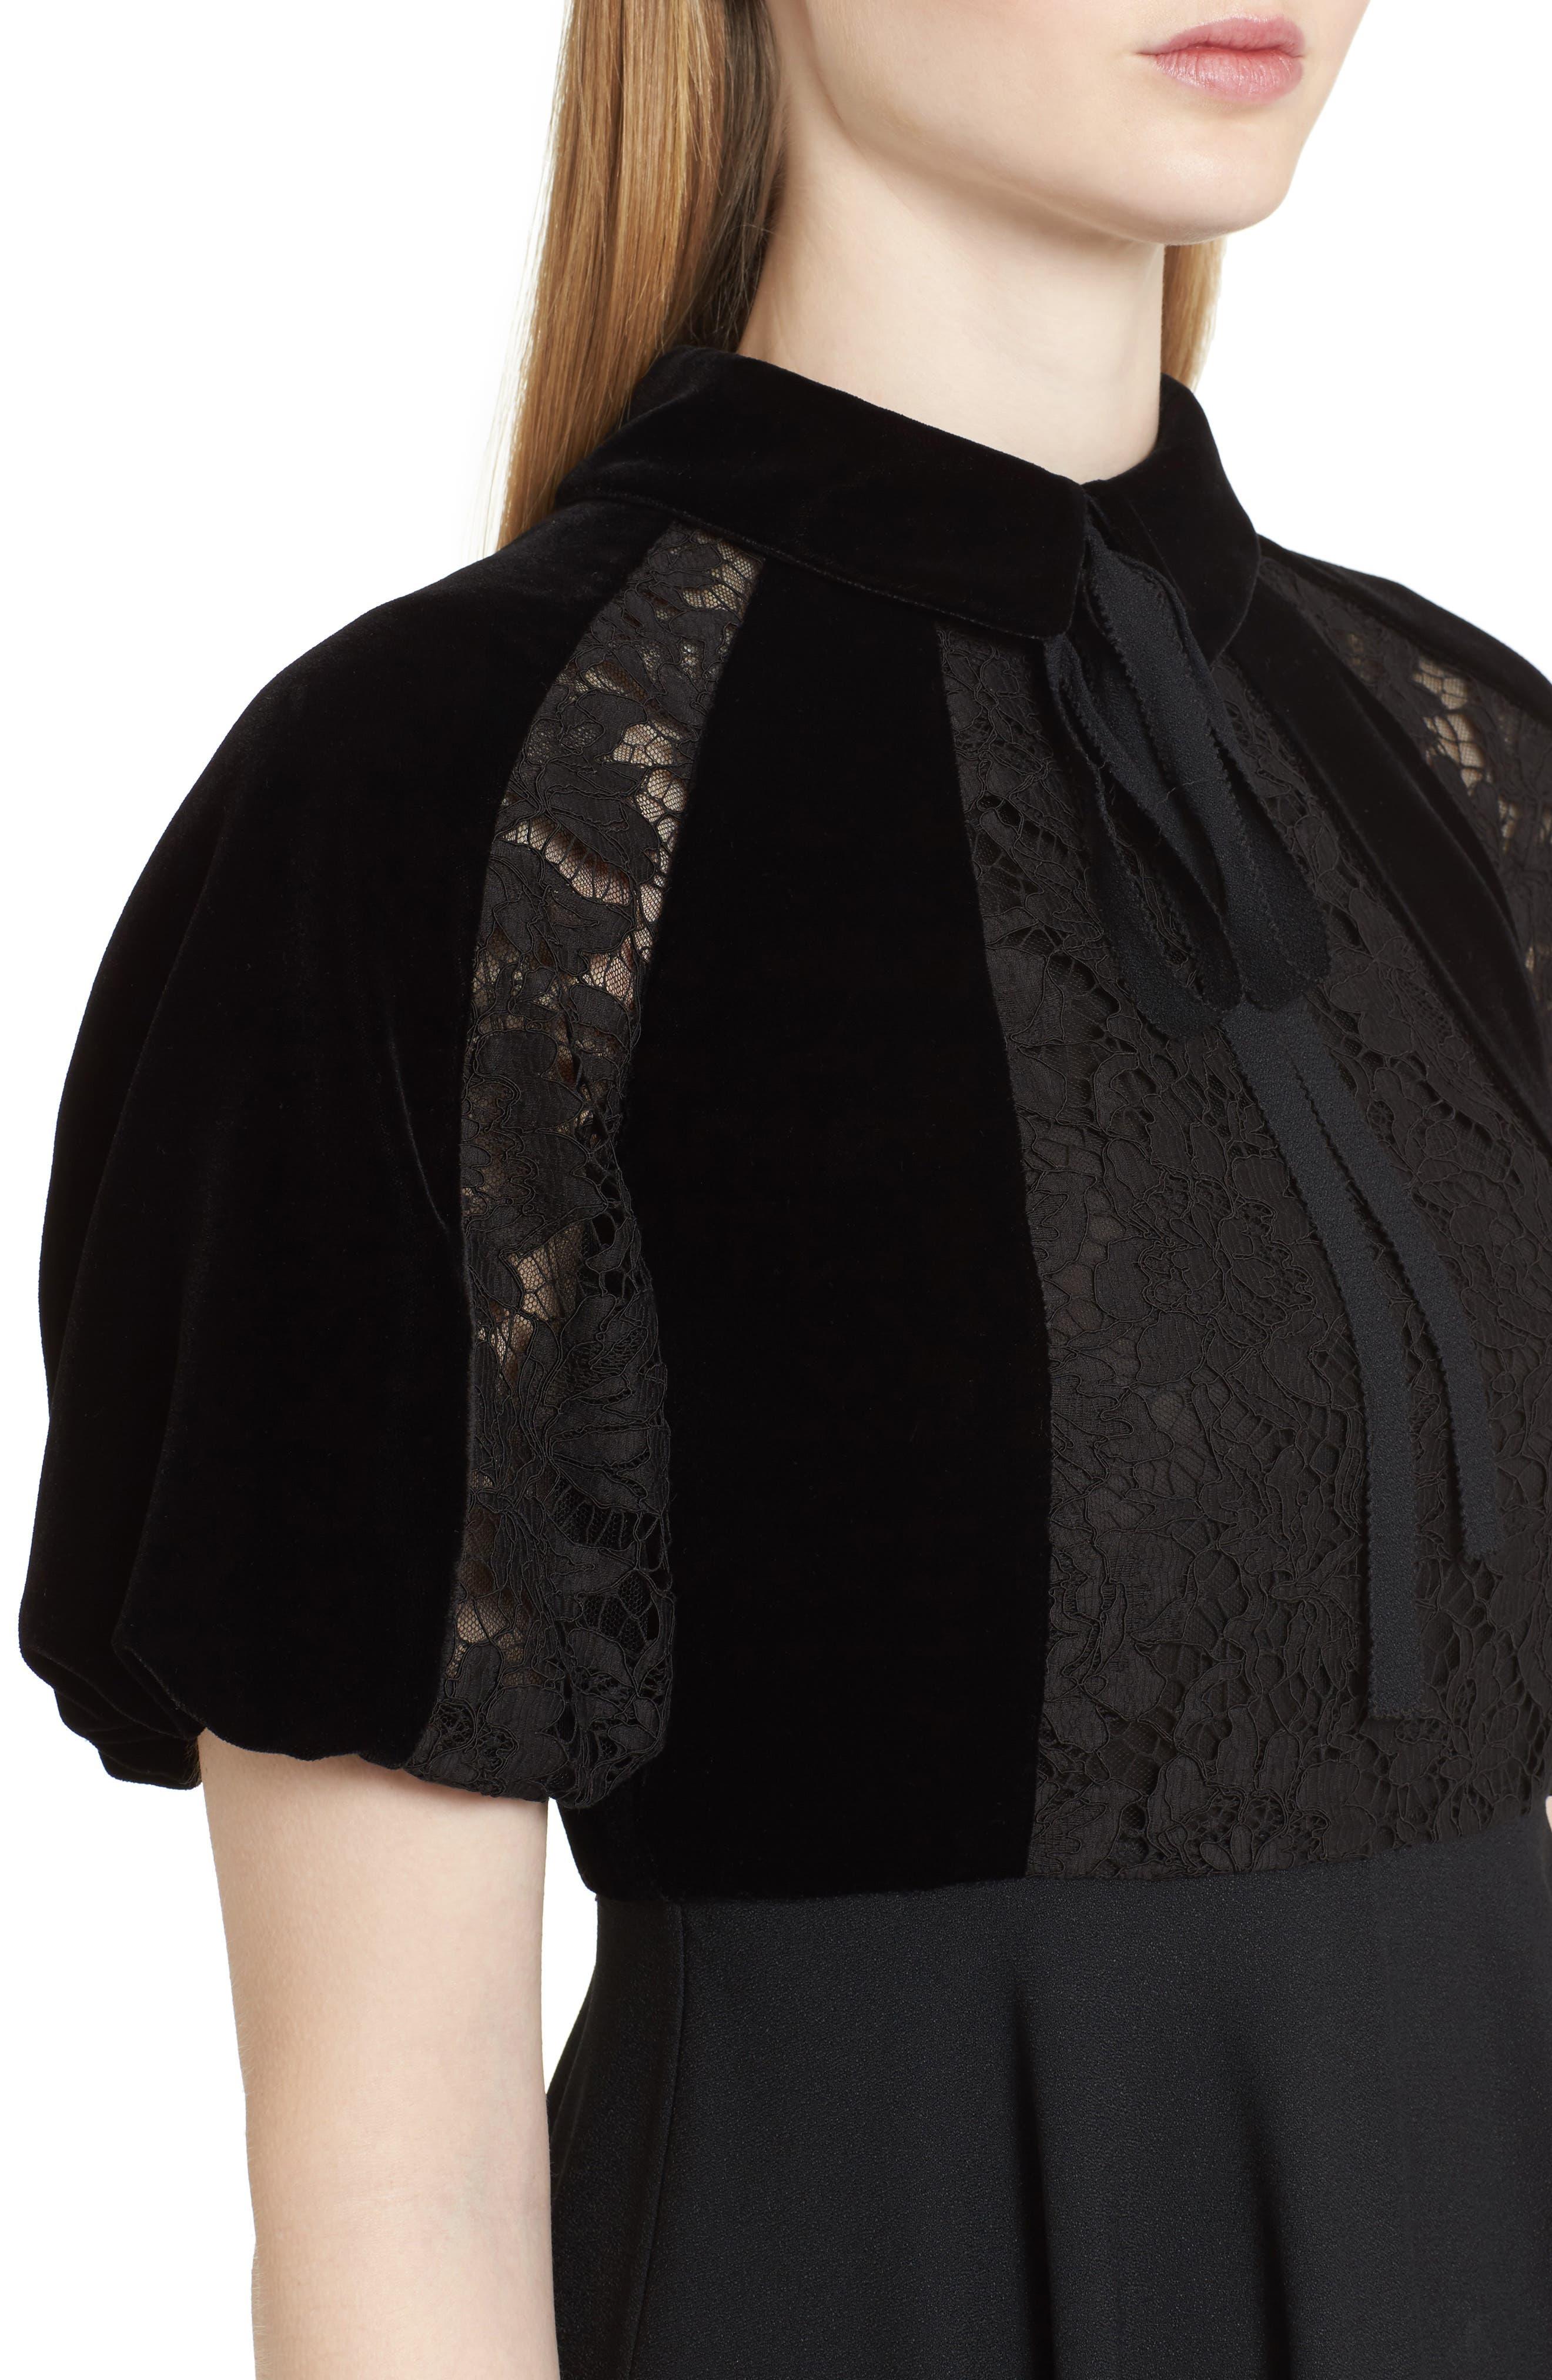 Guipure Lace Inset Crepe Dress,                             Alternate thumbnail 4, color,                             Black